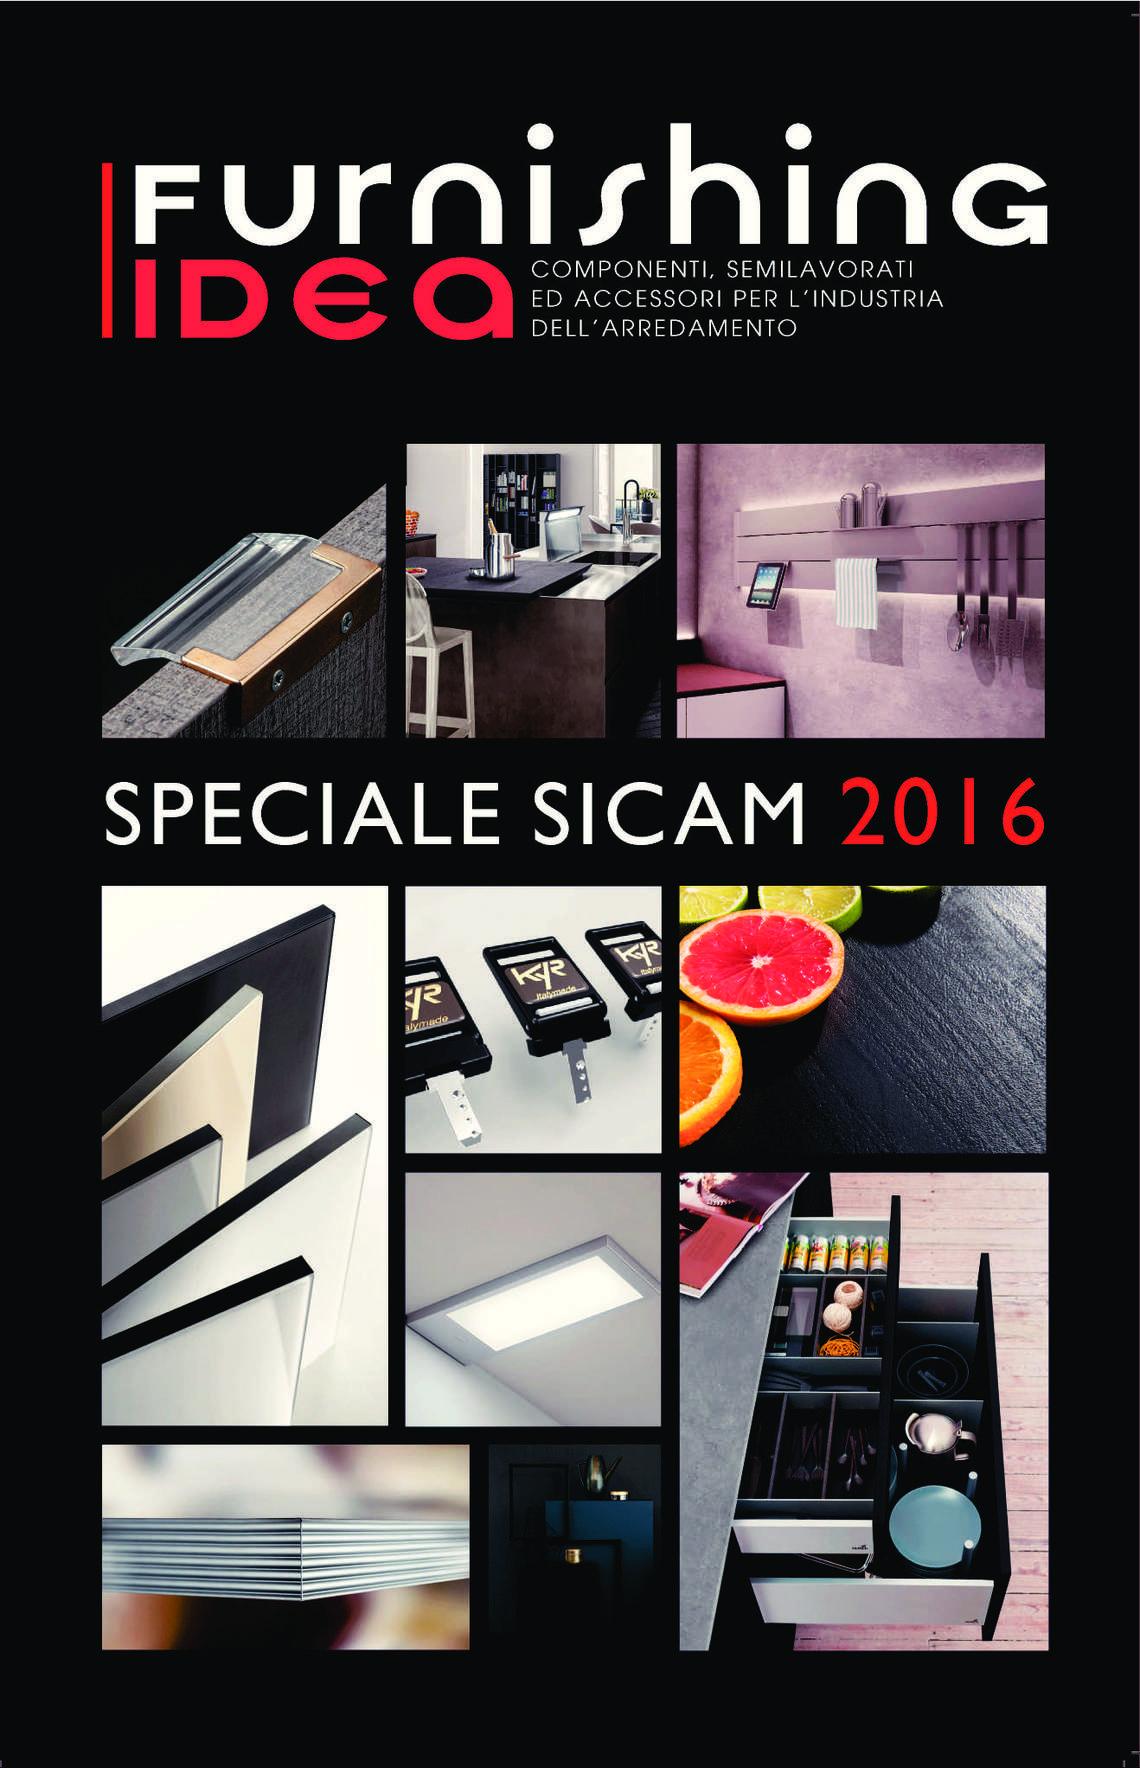 sicam-2016_journal_4_000.jpg